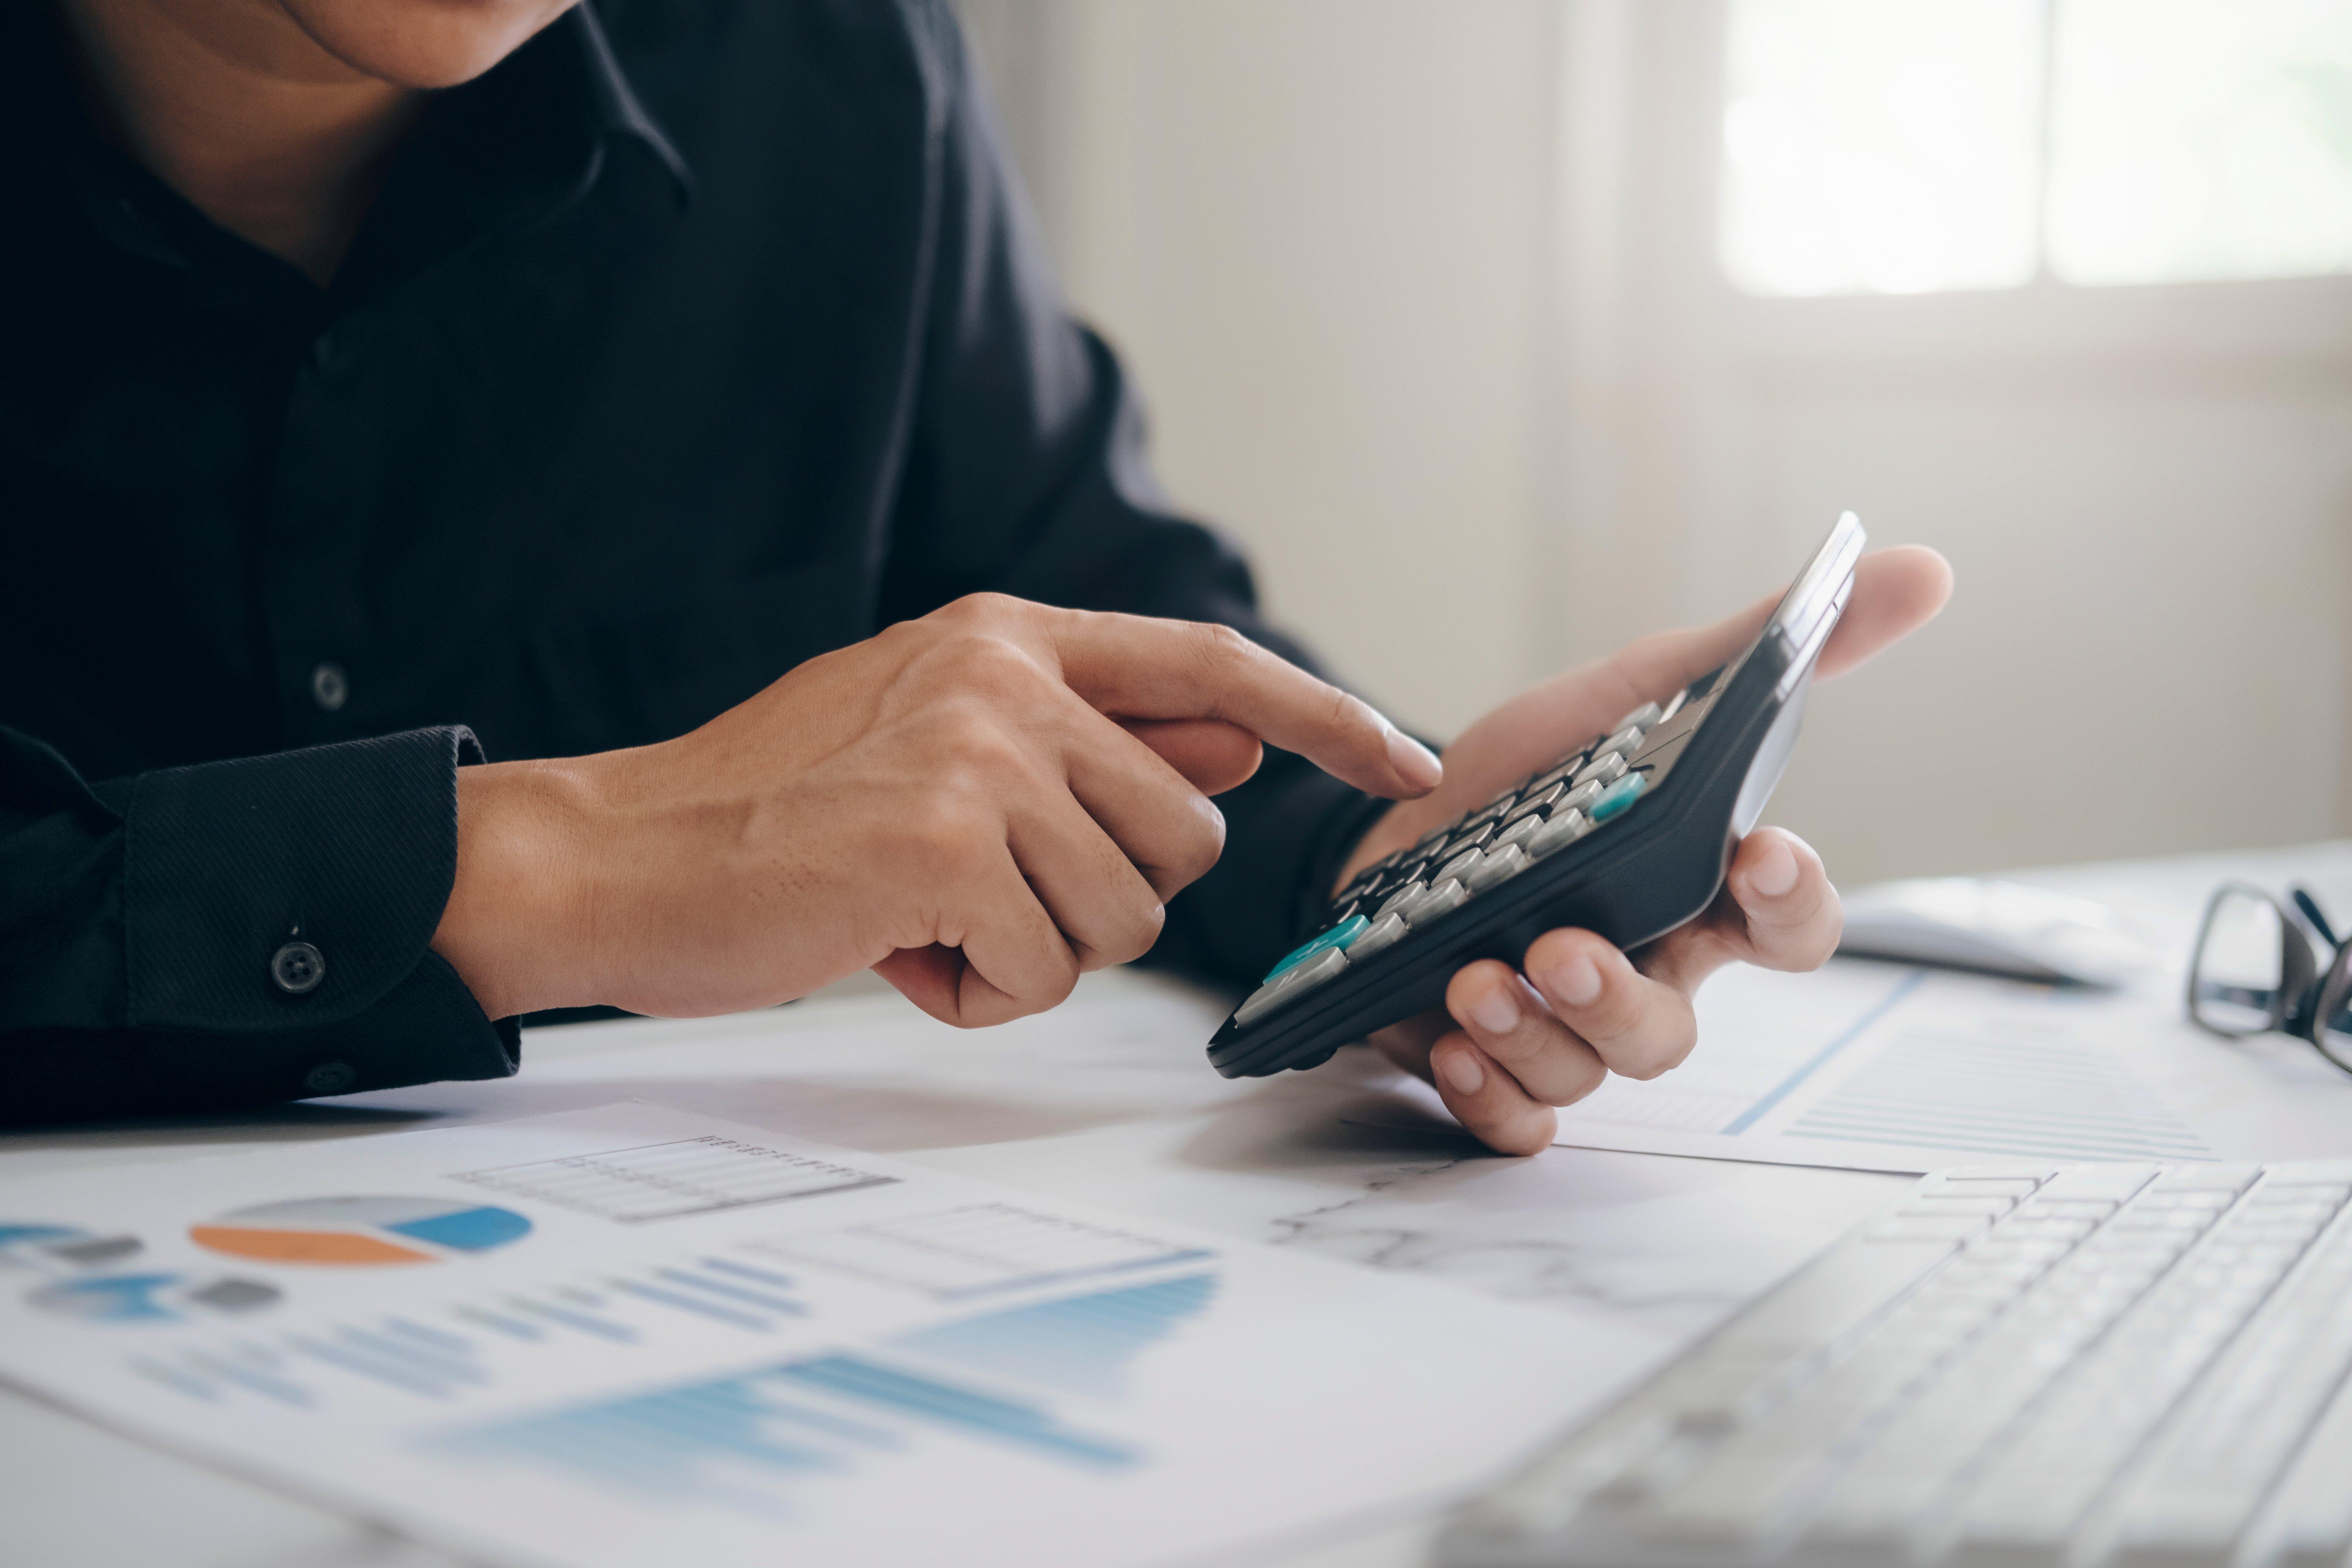 finances-saving-economy-concept-JX6Y5QP